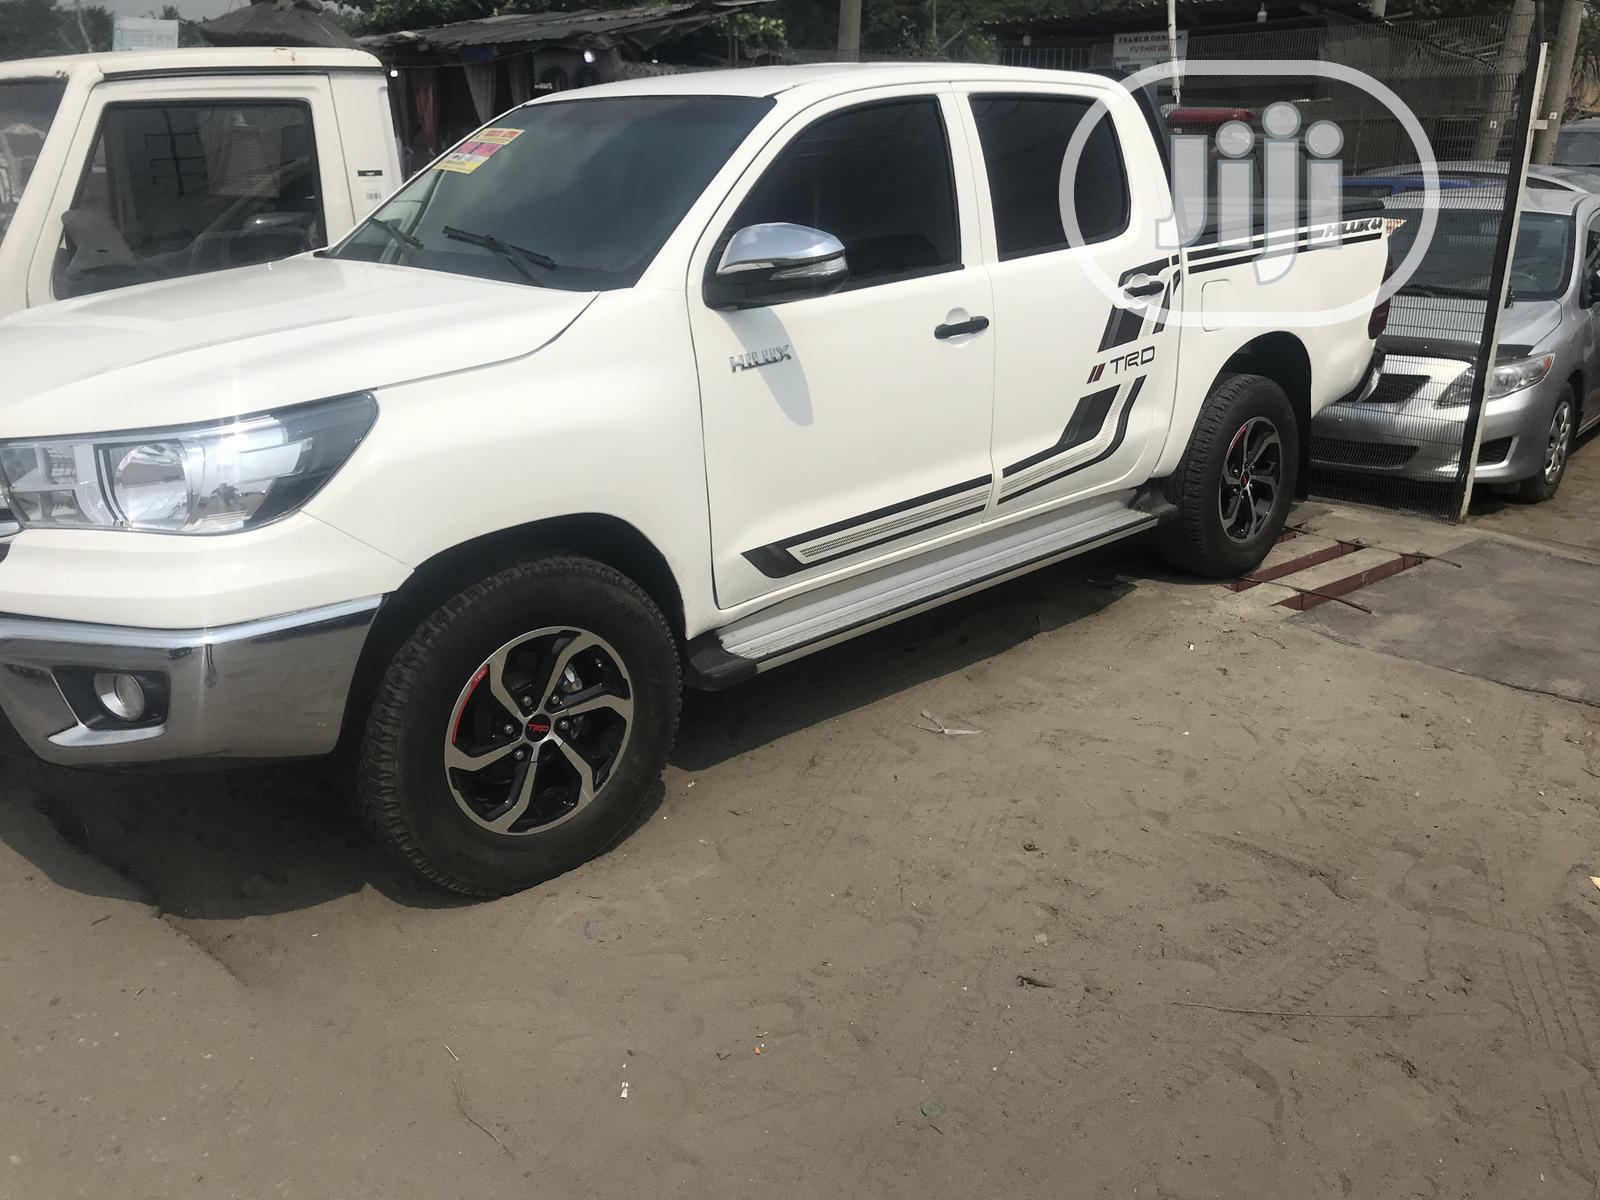 Toyota Hilux 2017 TRD White 4x4 White   Cars for sale in Lekki, Lagos State, Nigeria